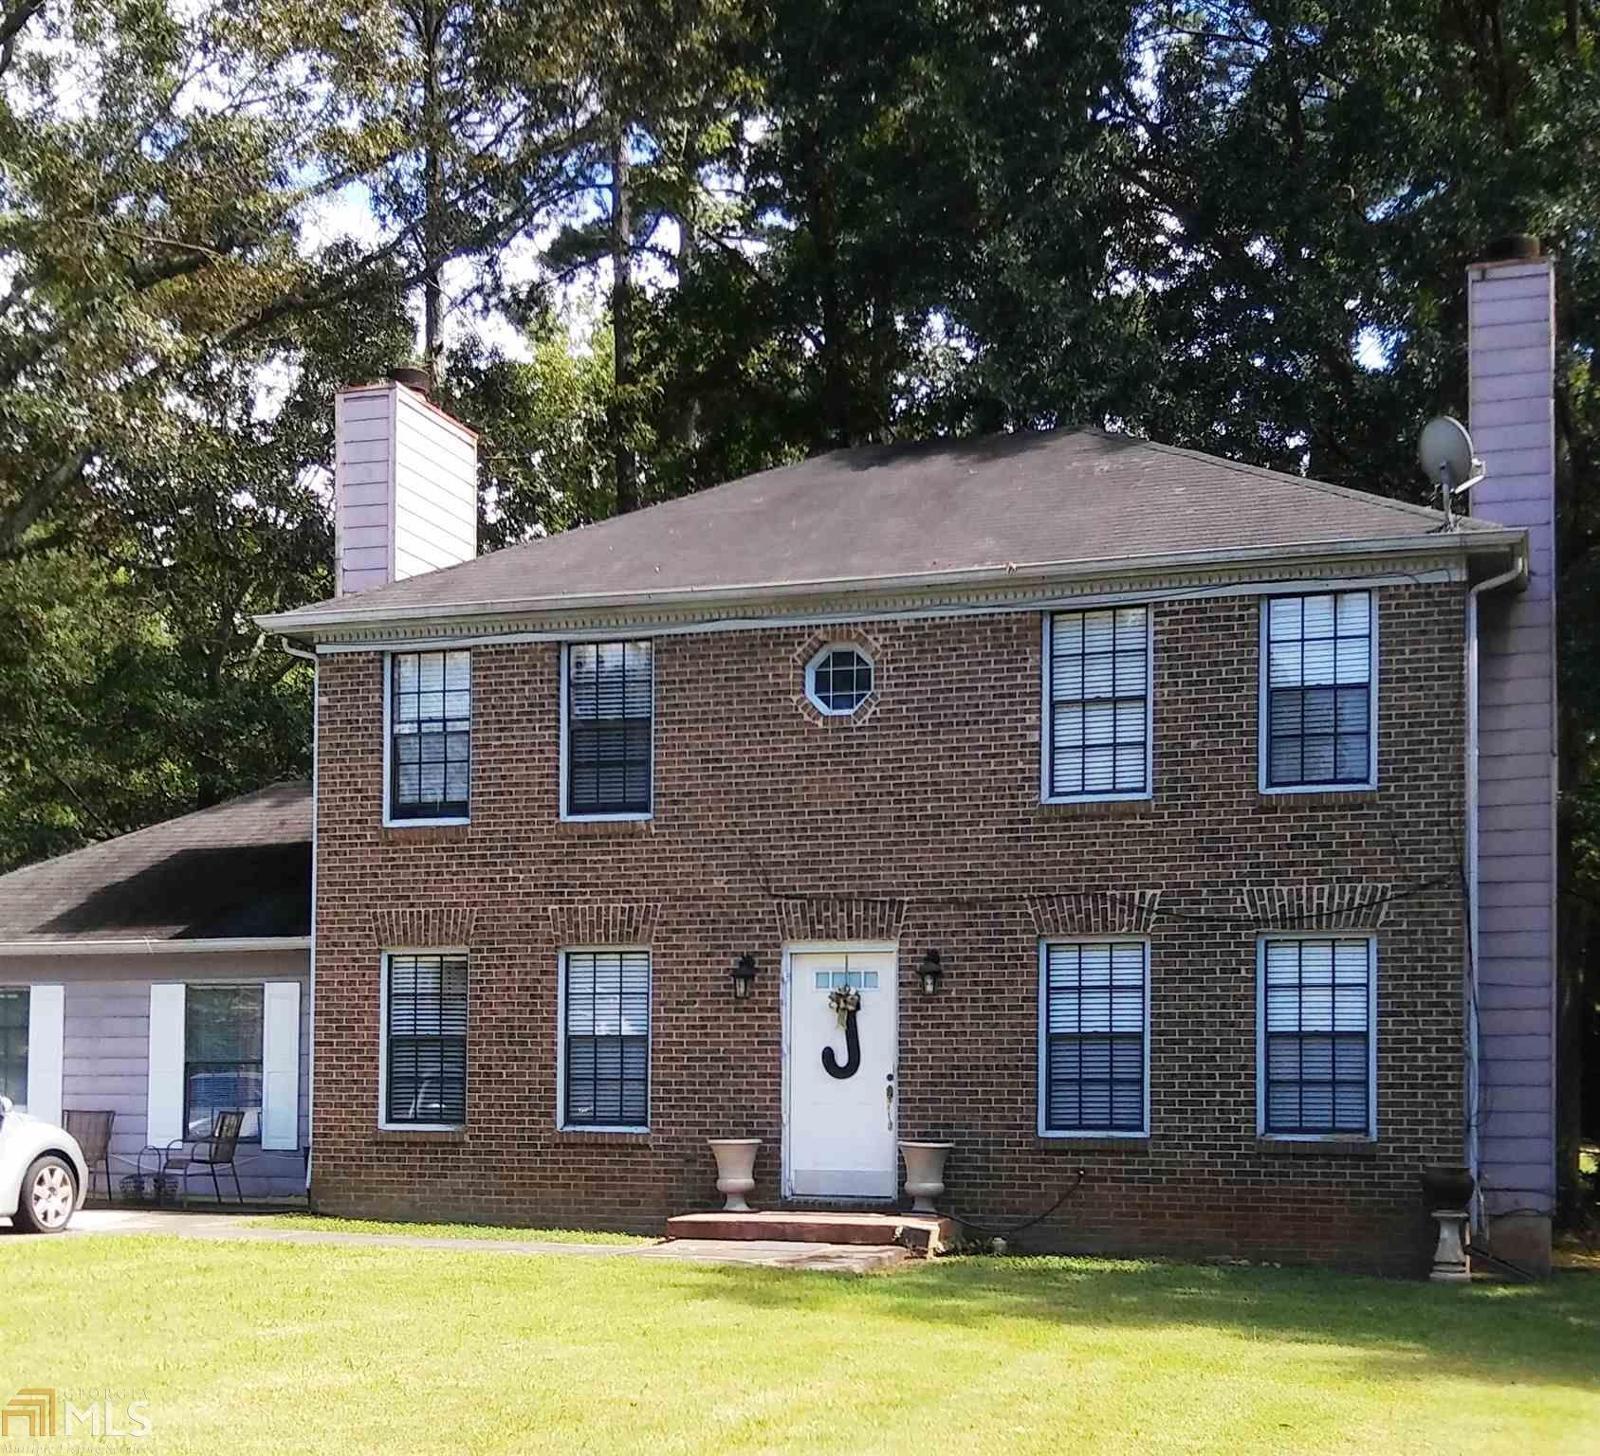 460 Martin Dr Jonesboro Ga Mls 8227733 Better Homes And Gardens Real Estate